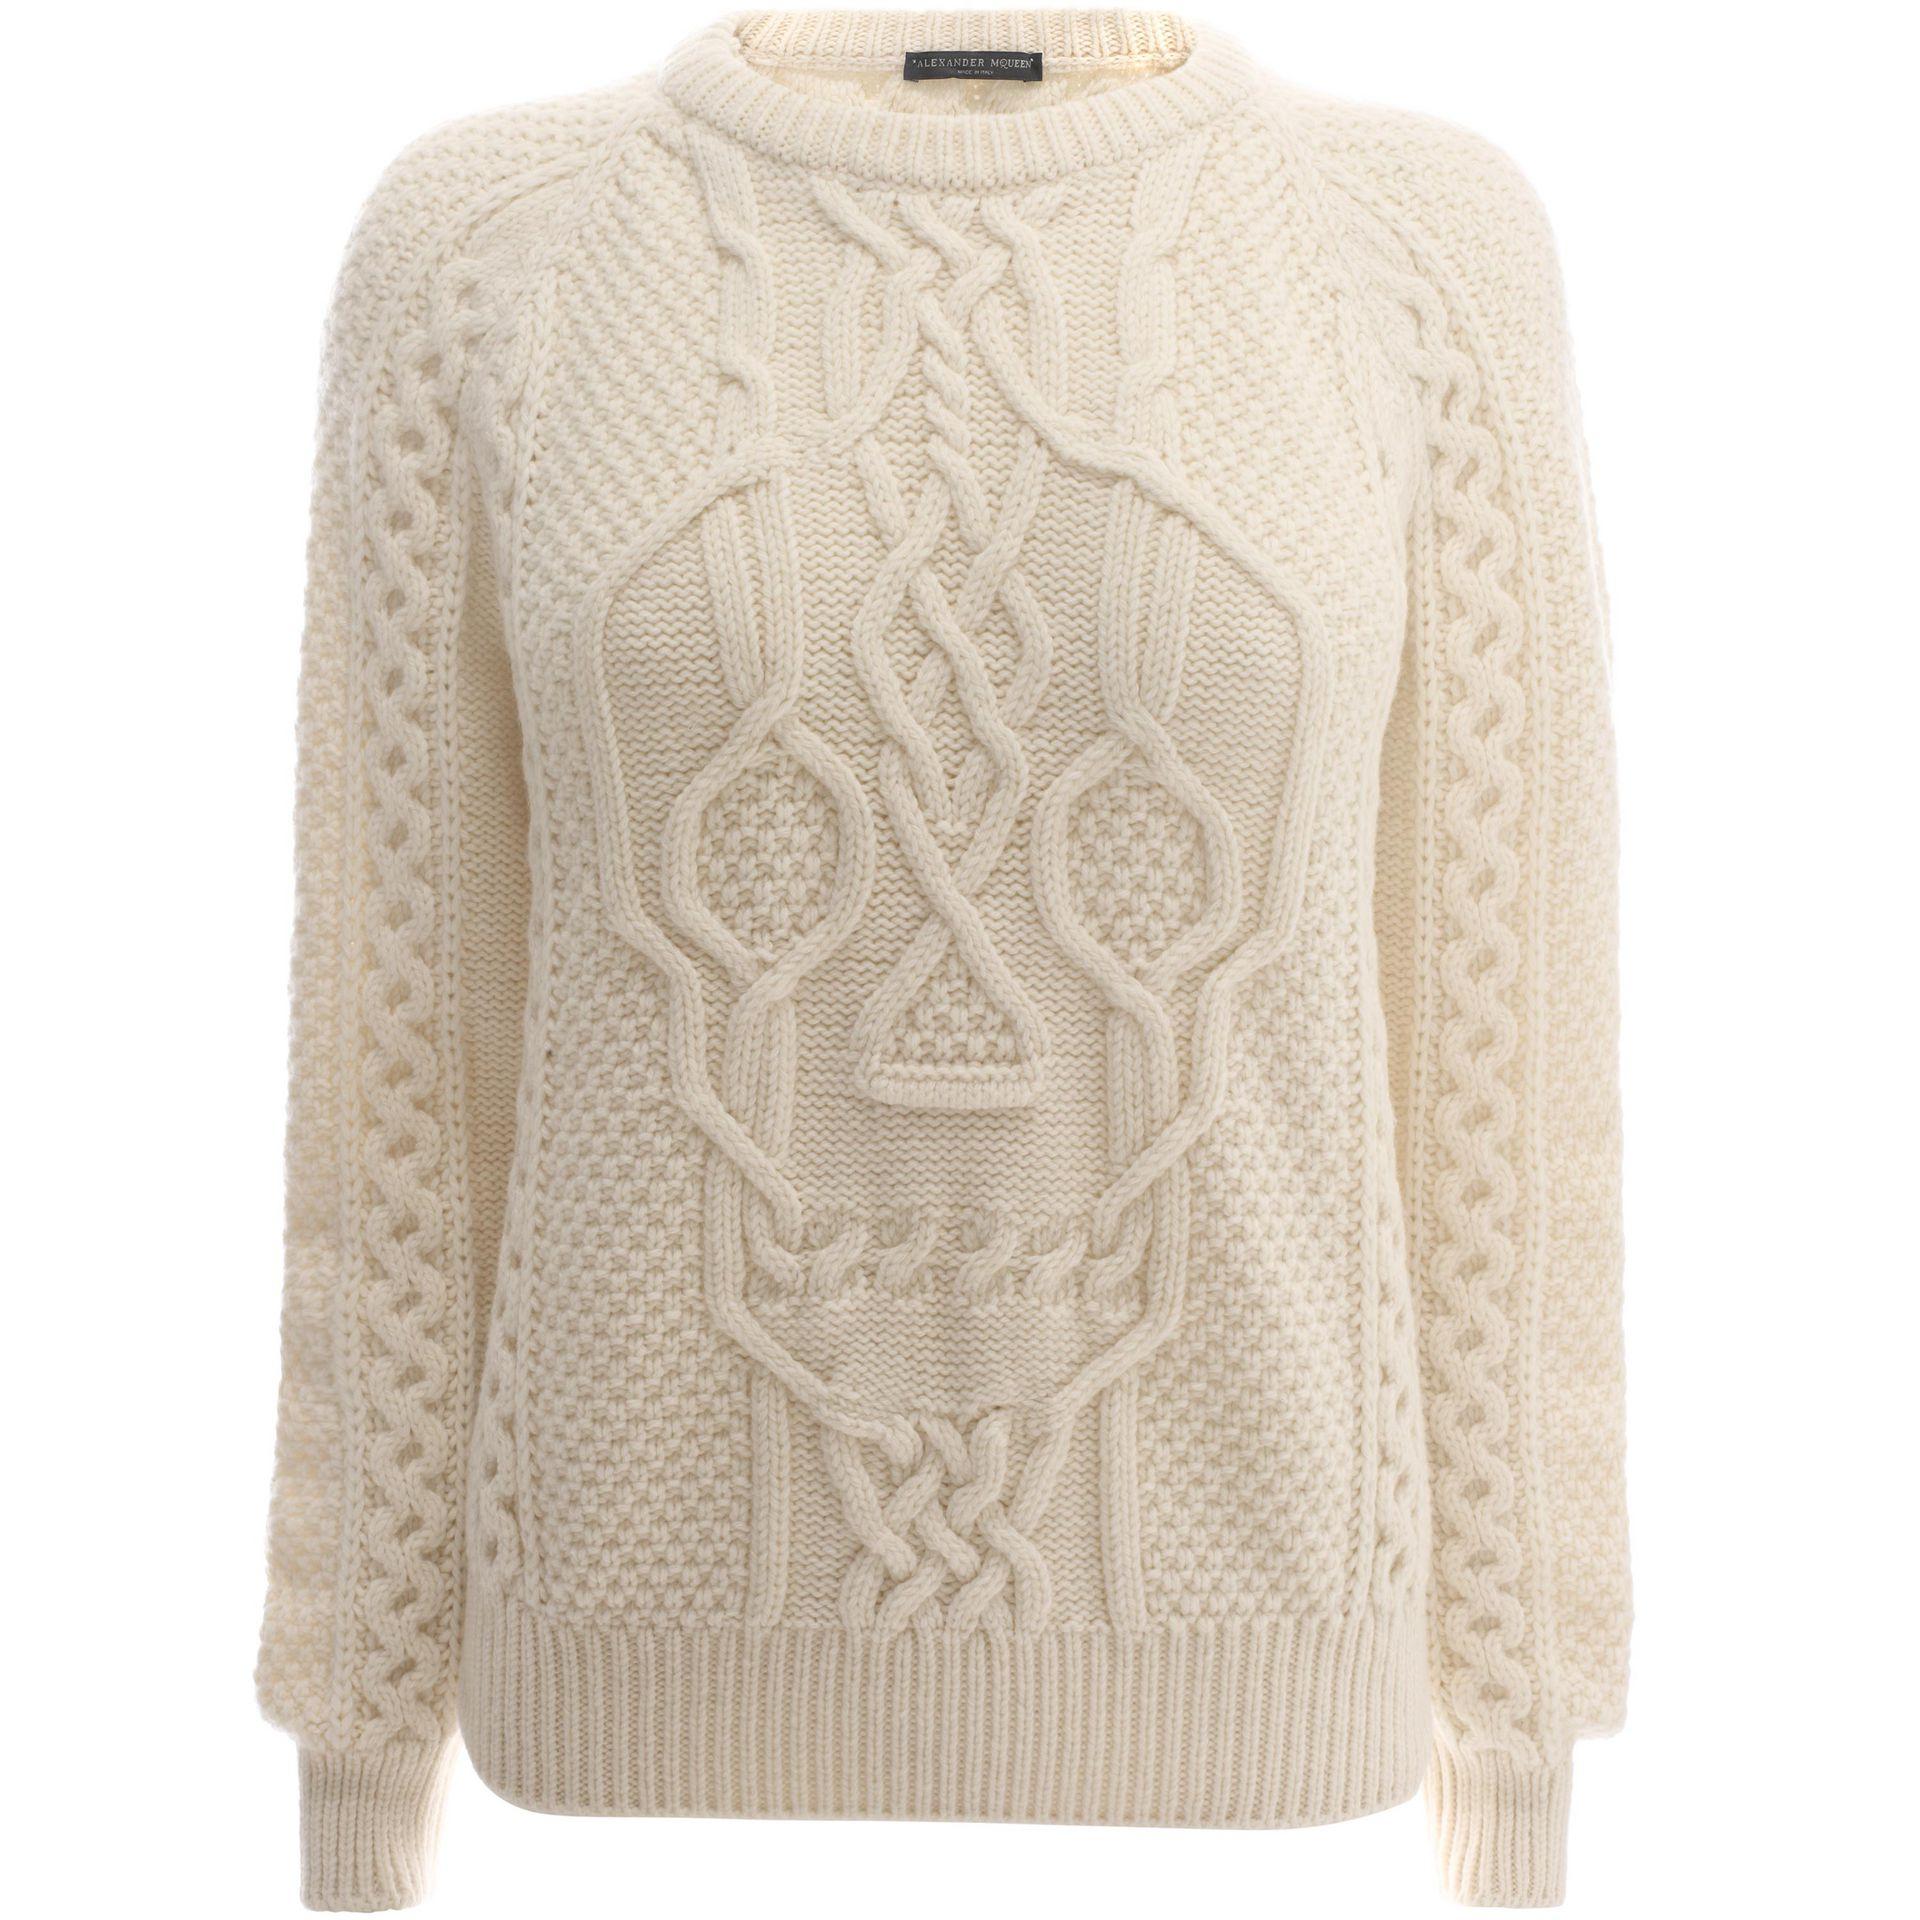 Aran Jumper Dress Knitting Pattern : Alexander mcqueen Aran Skull Knit Jumper in White Lyst